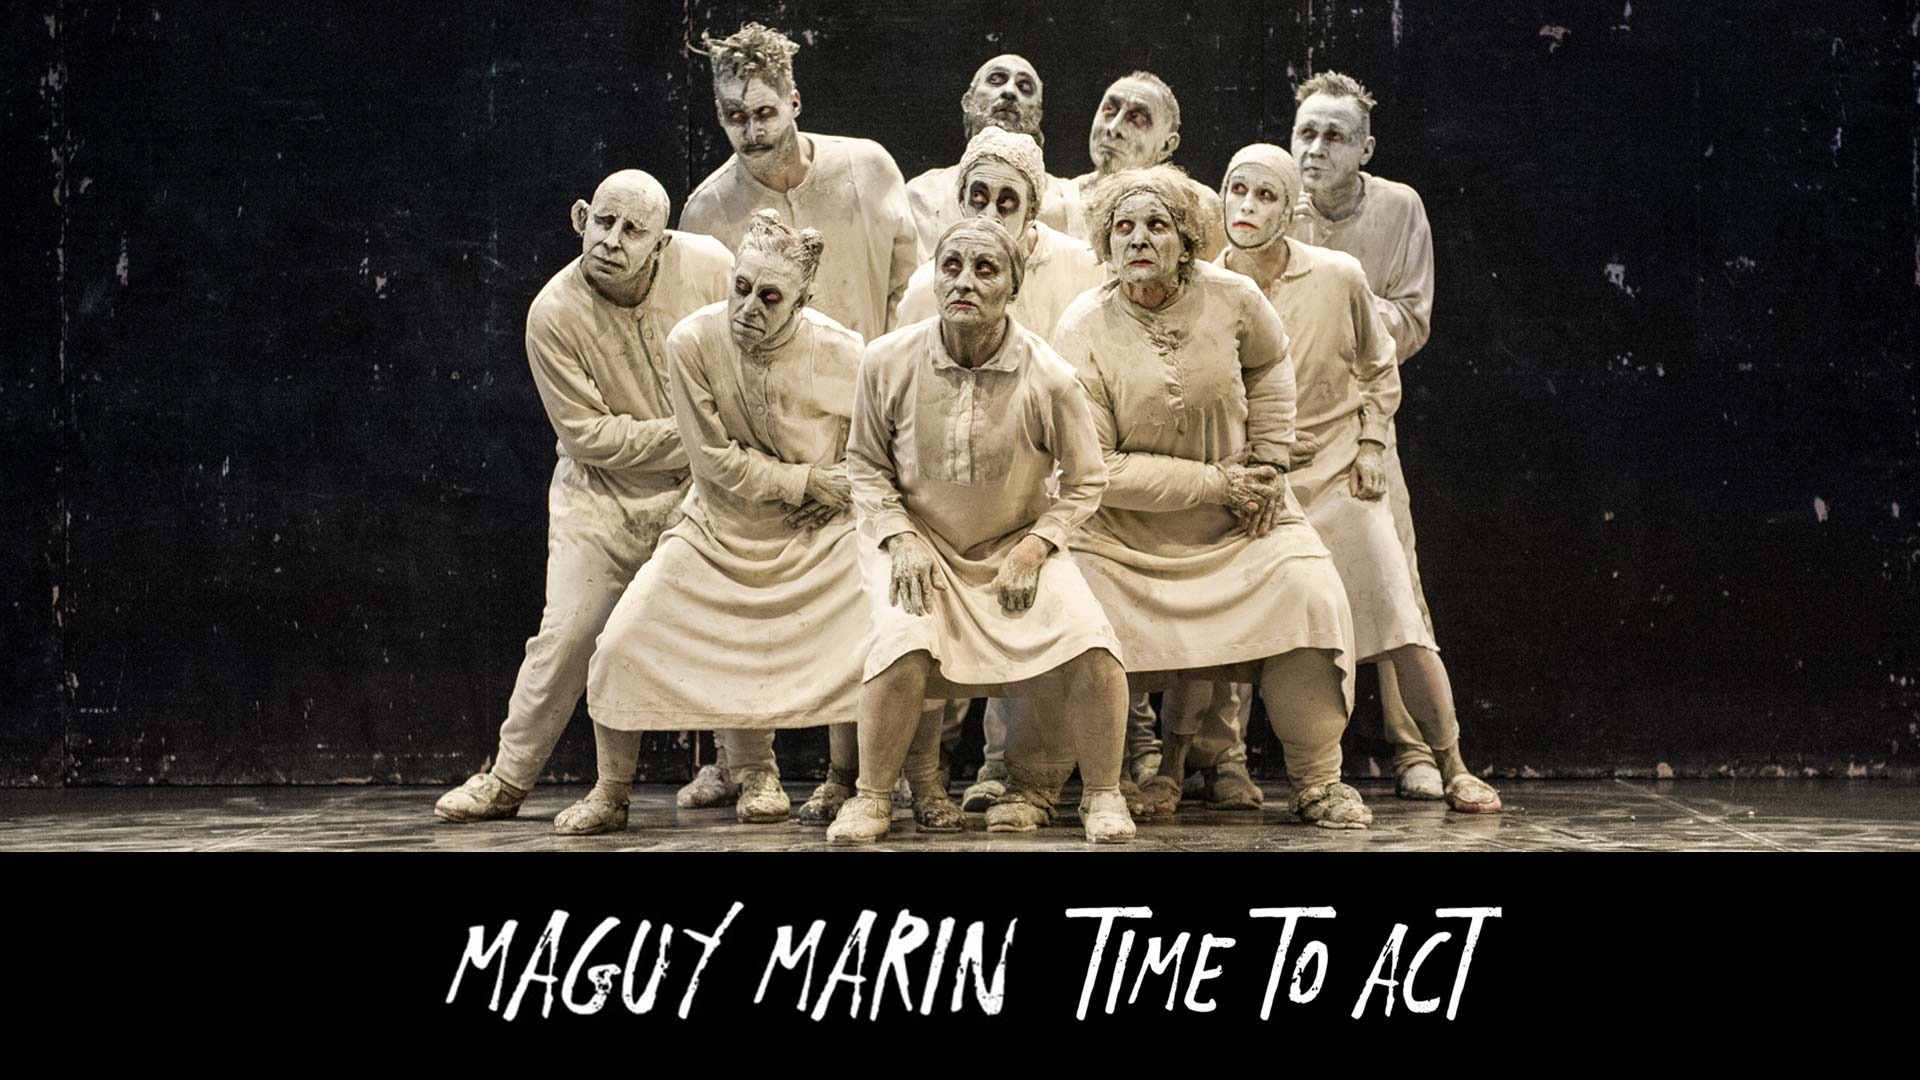 Maguy Marin - image